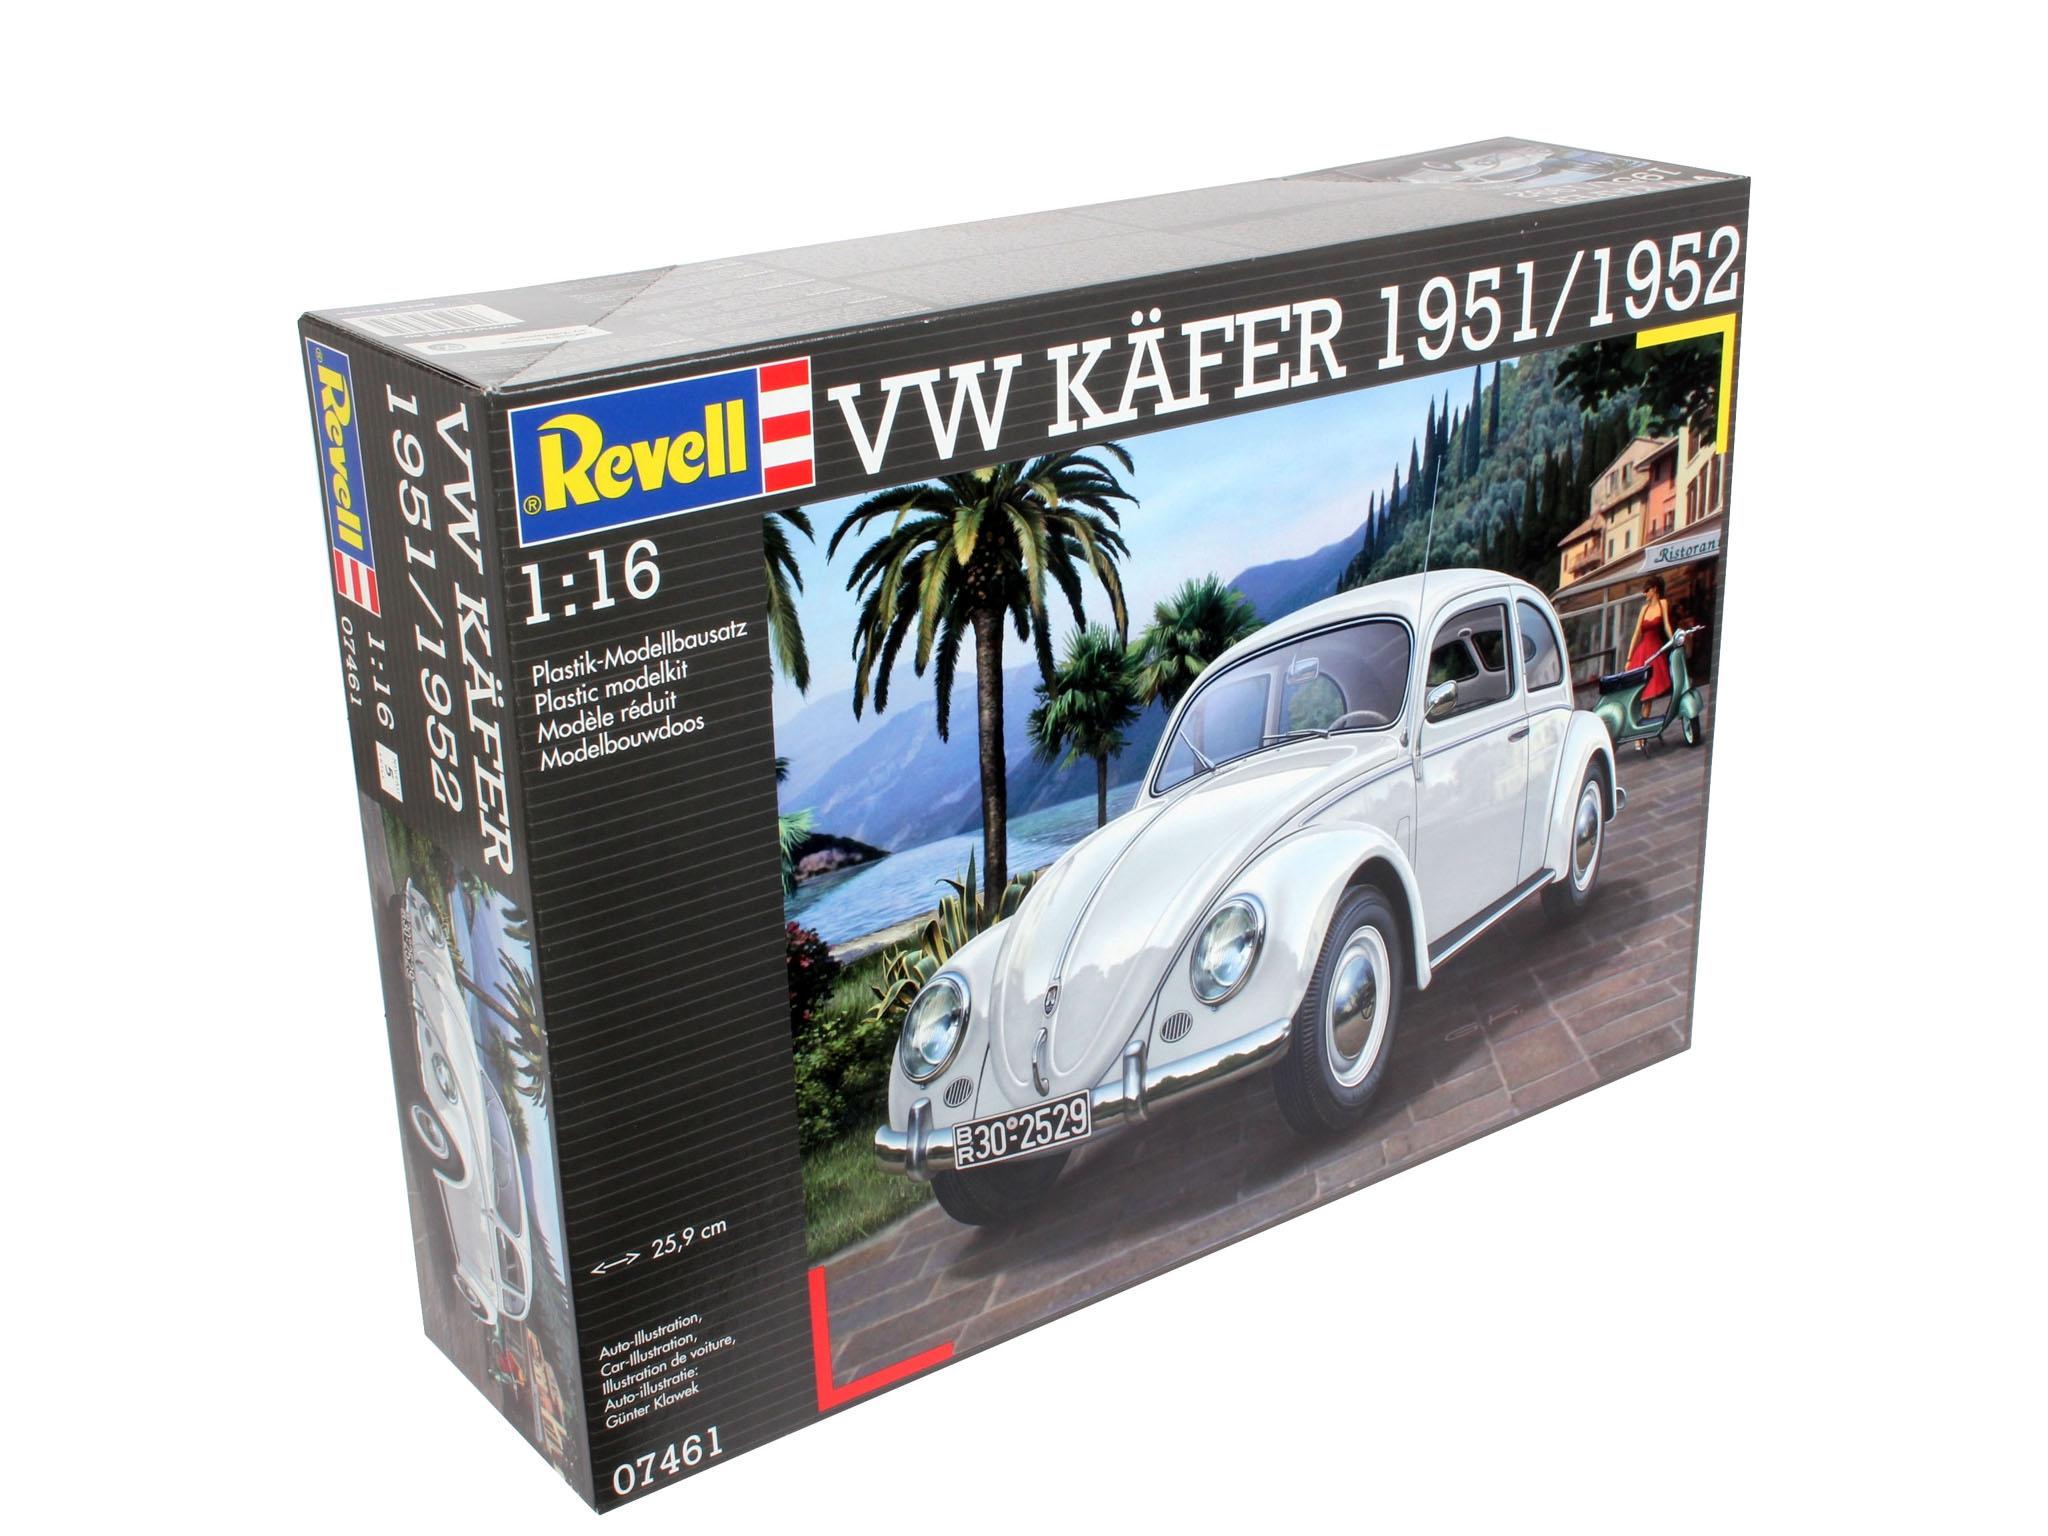 revell 07461 vw k fer 1951 52 modellbau remscheid carrera rc spielwaren spielzeug roboter. Black Bedroom Furniture Sets. Home Design Ideas